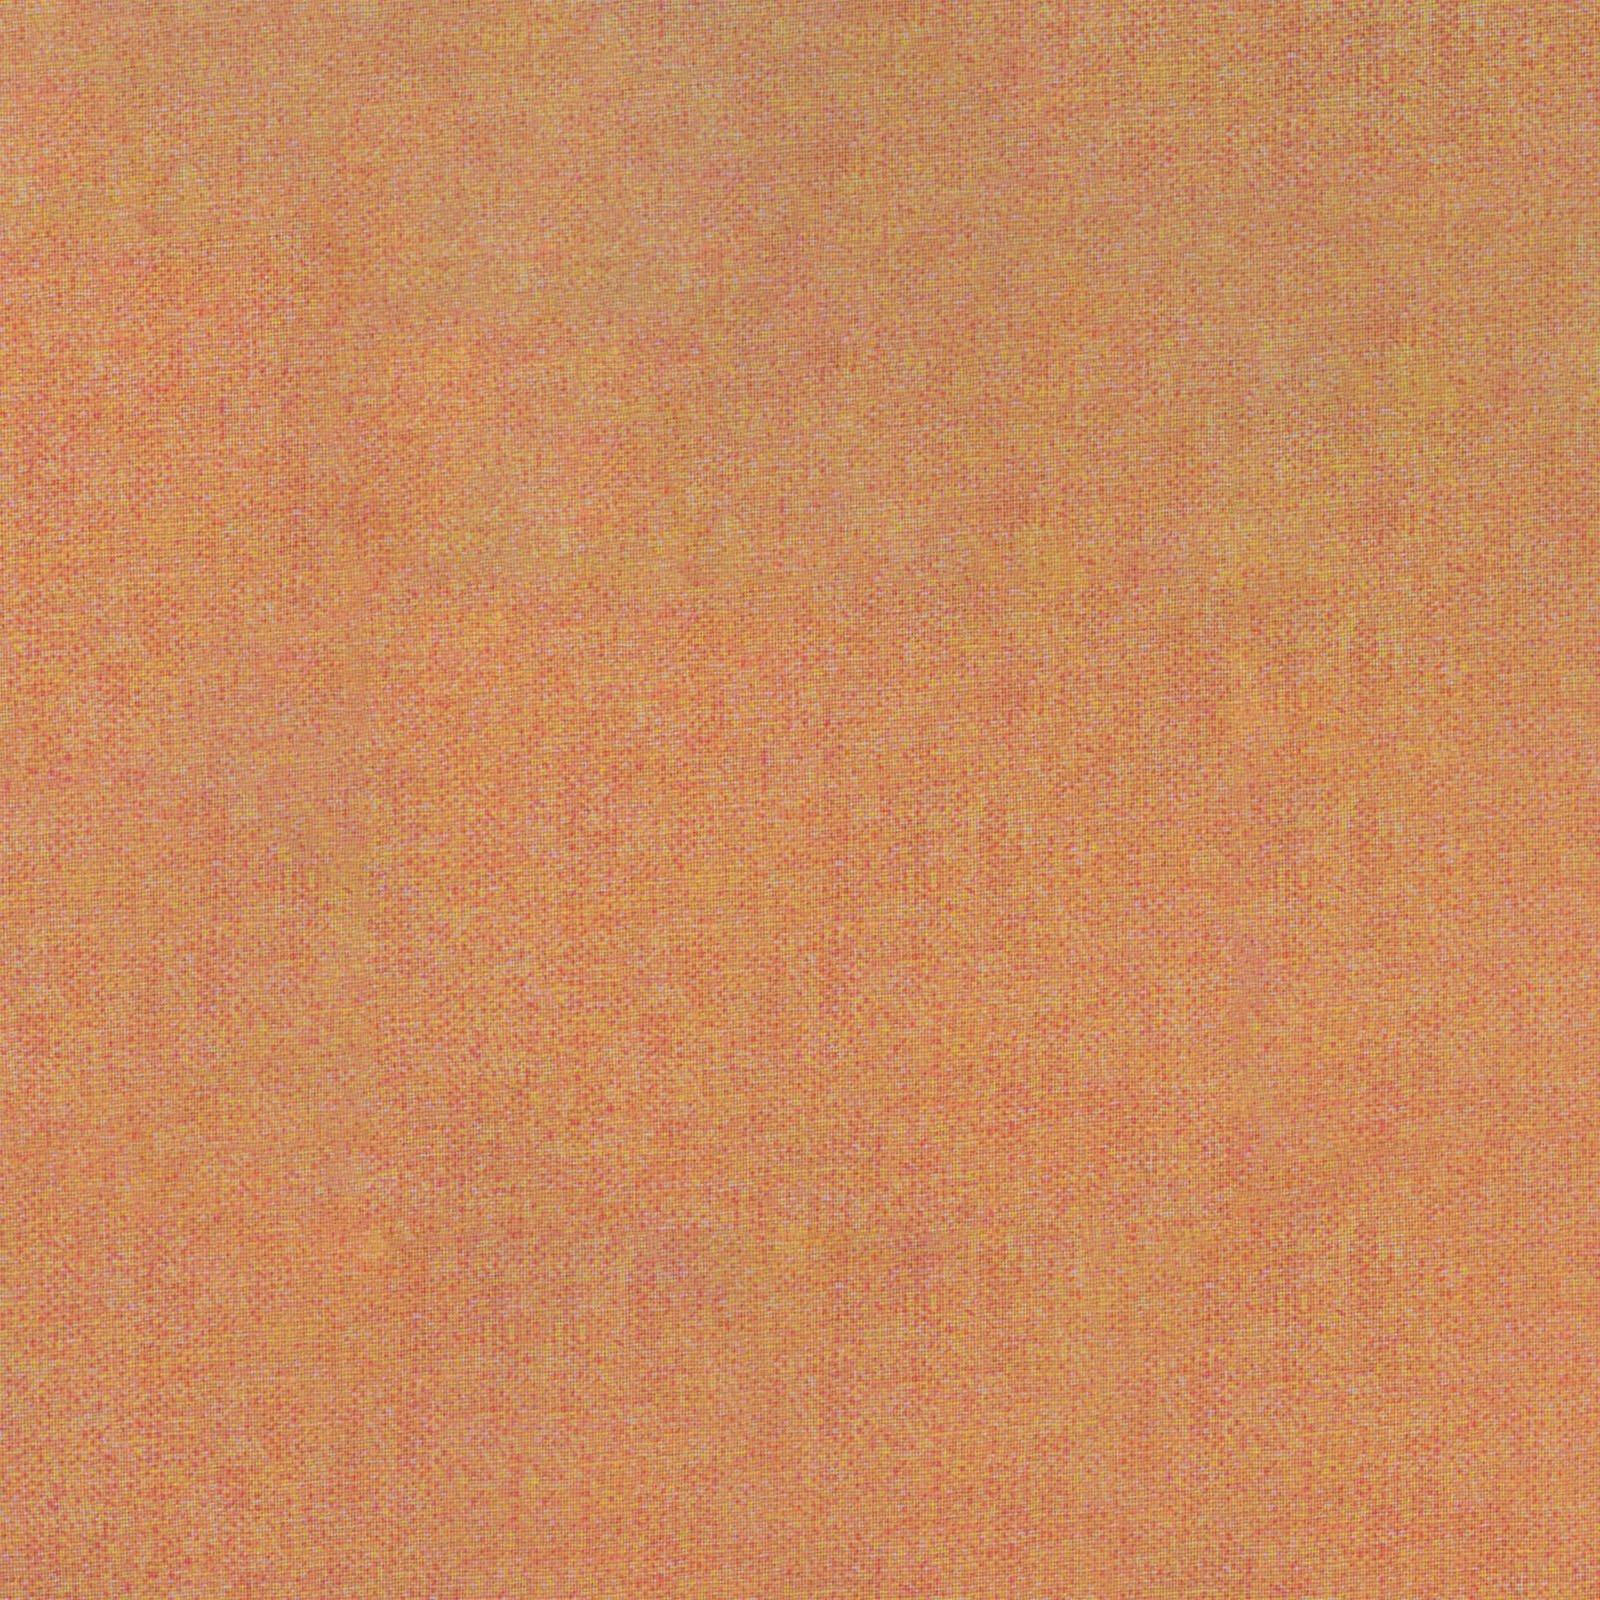 Tweed Texture  MAS22214-OY